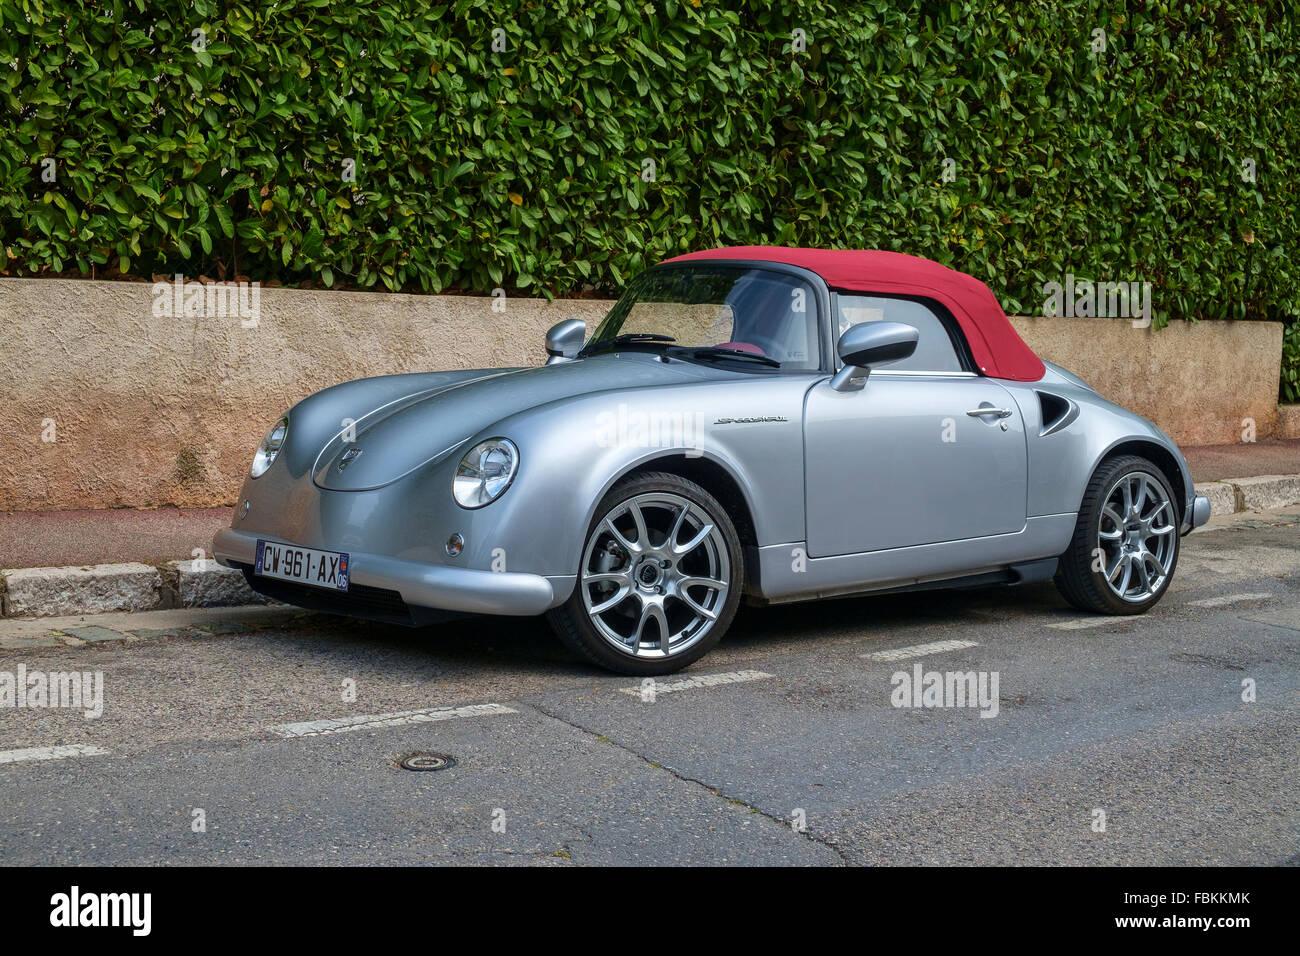 french convertible sportscar pgo speedster II 2 - Stock Image